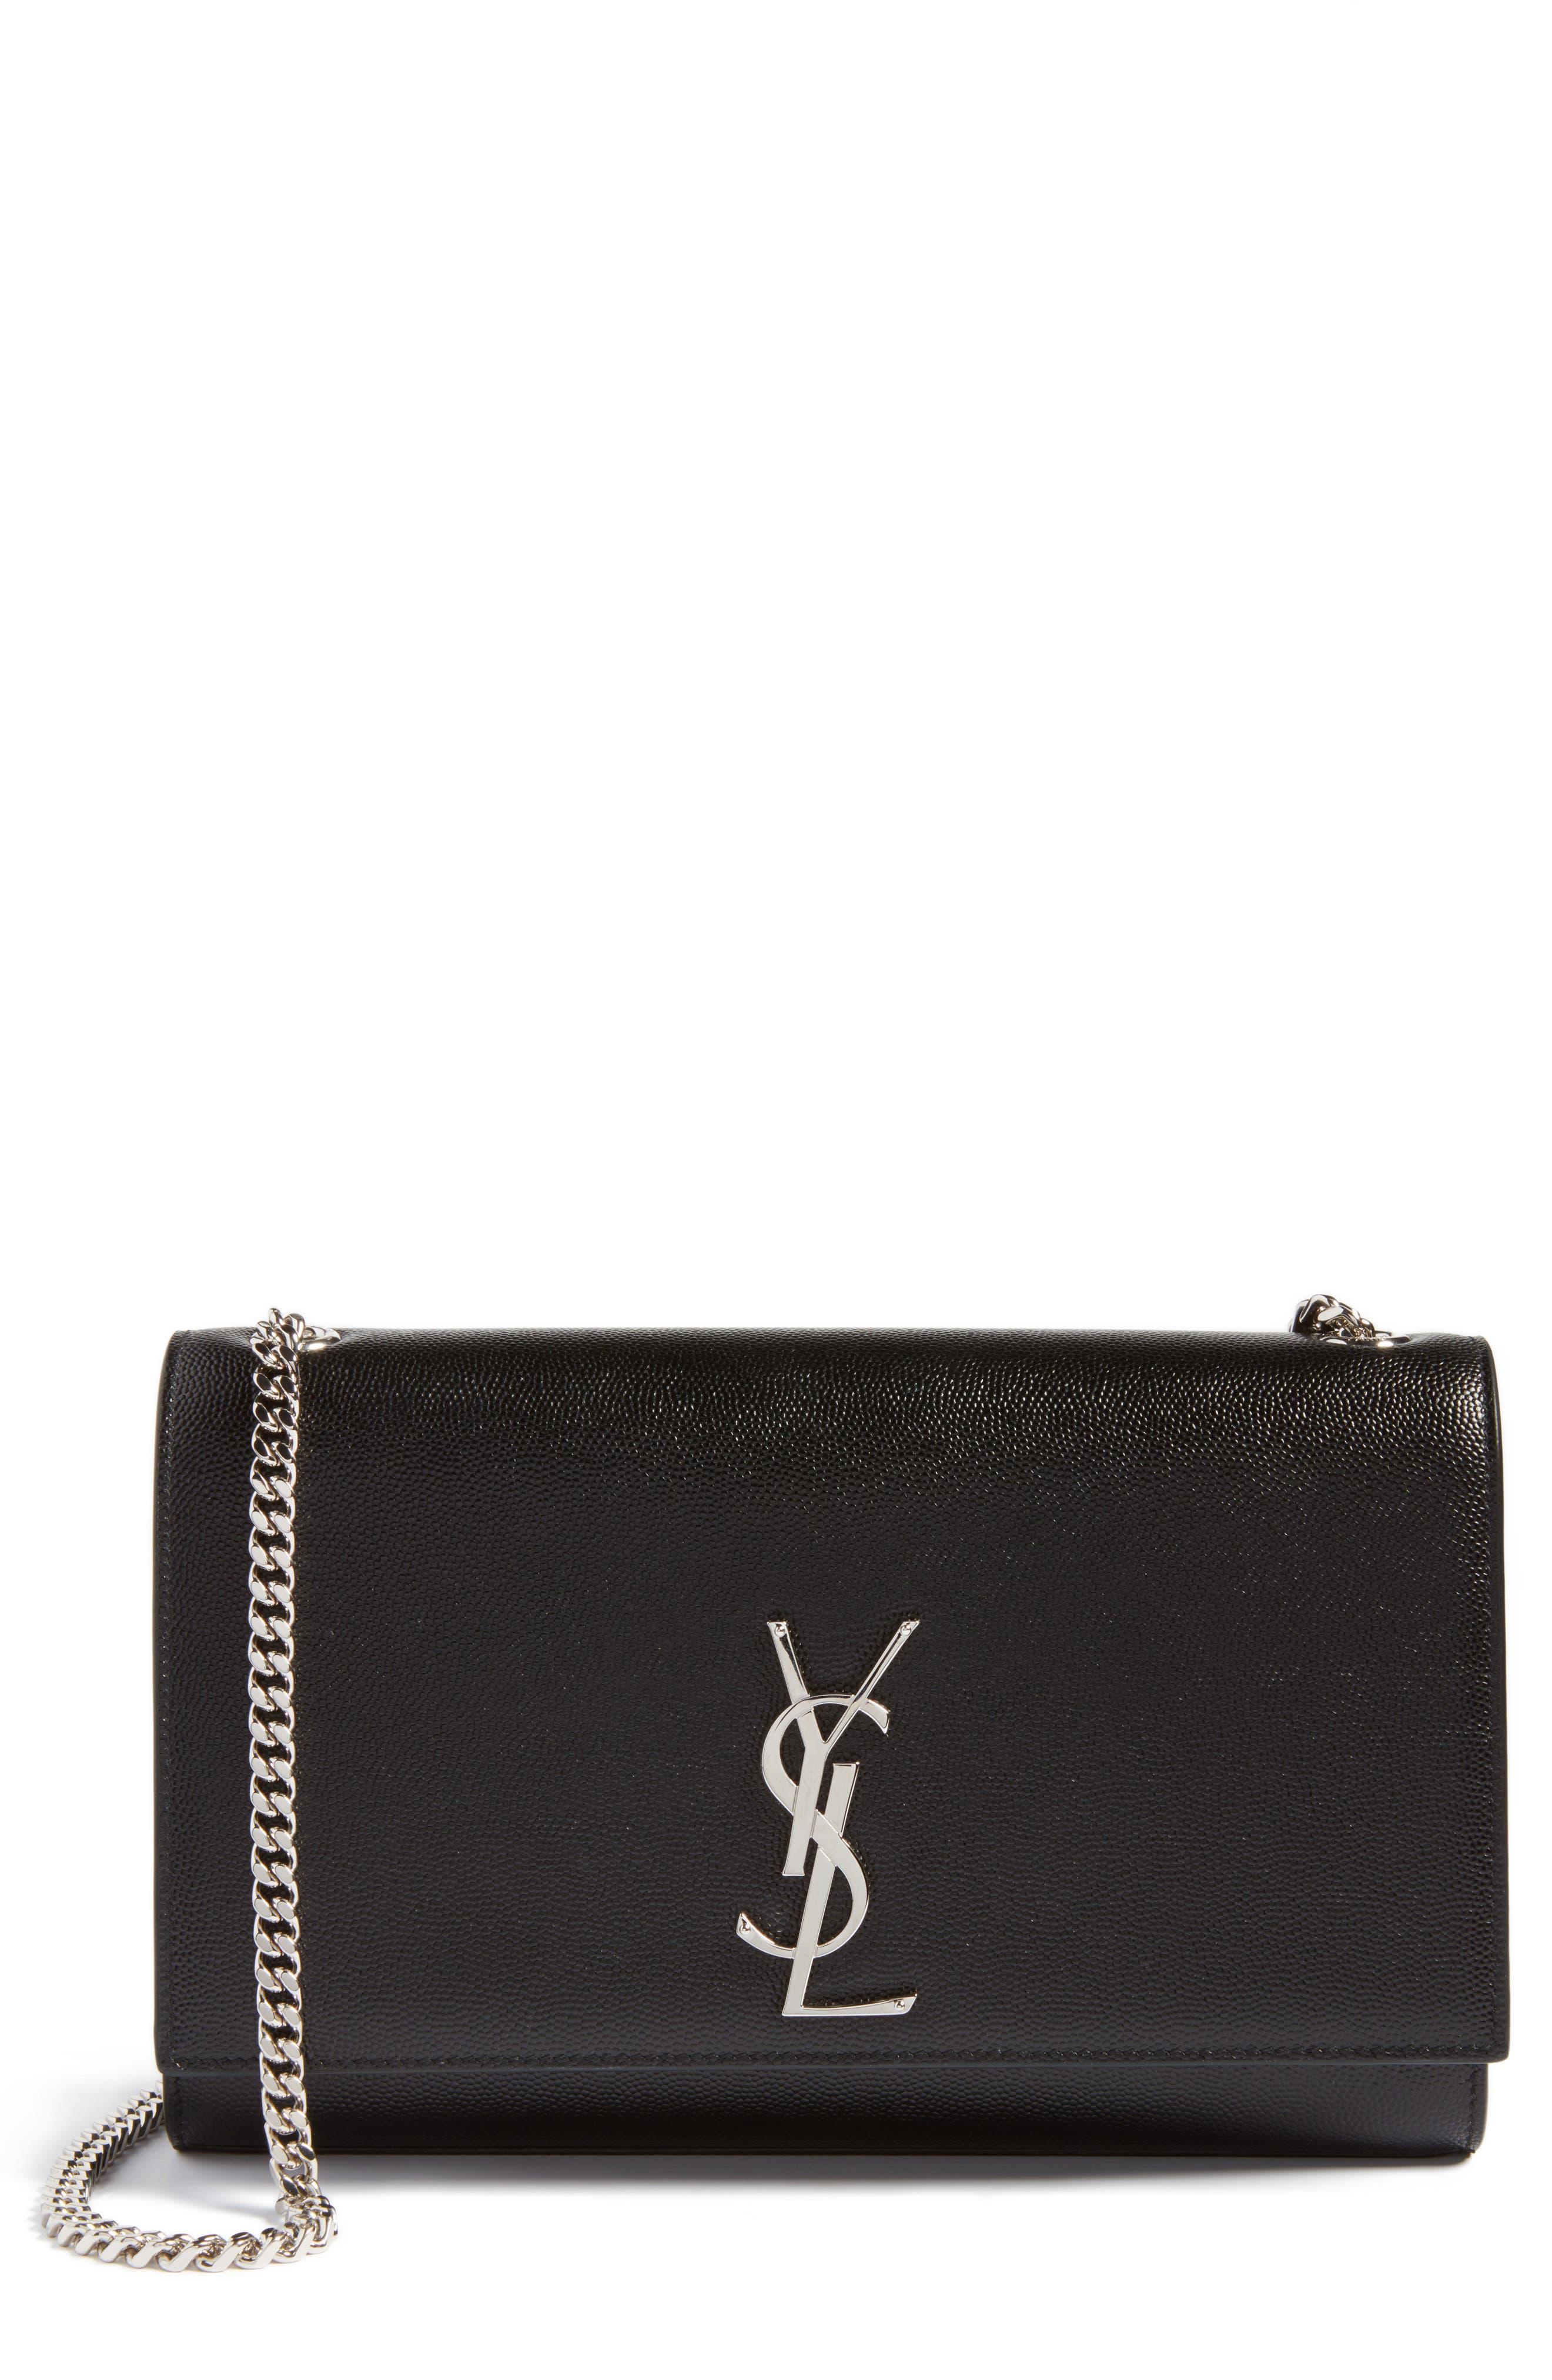 Medium Kate Calfskin Leather Shoulder Bag,                             Main thumbnail 1, color,                             NERO